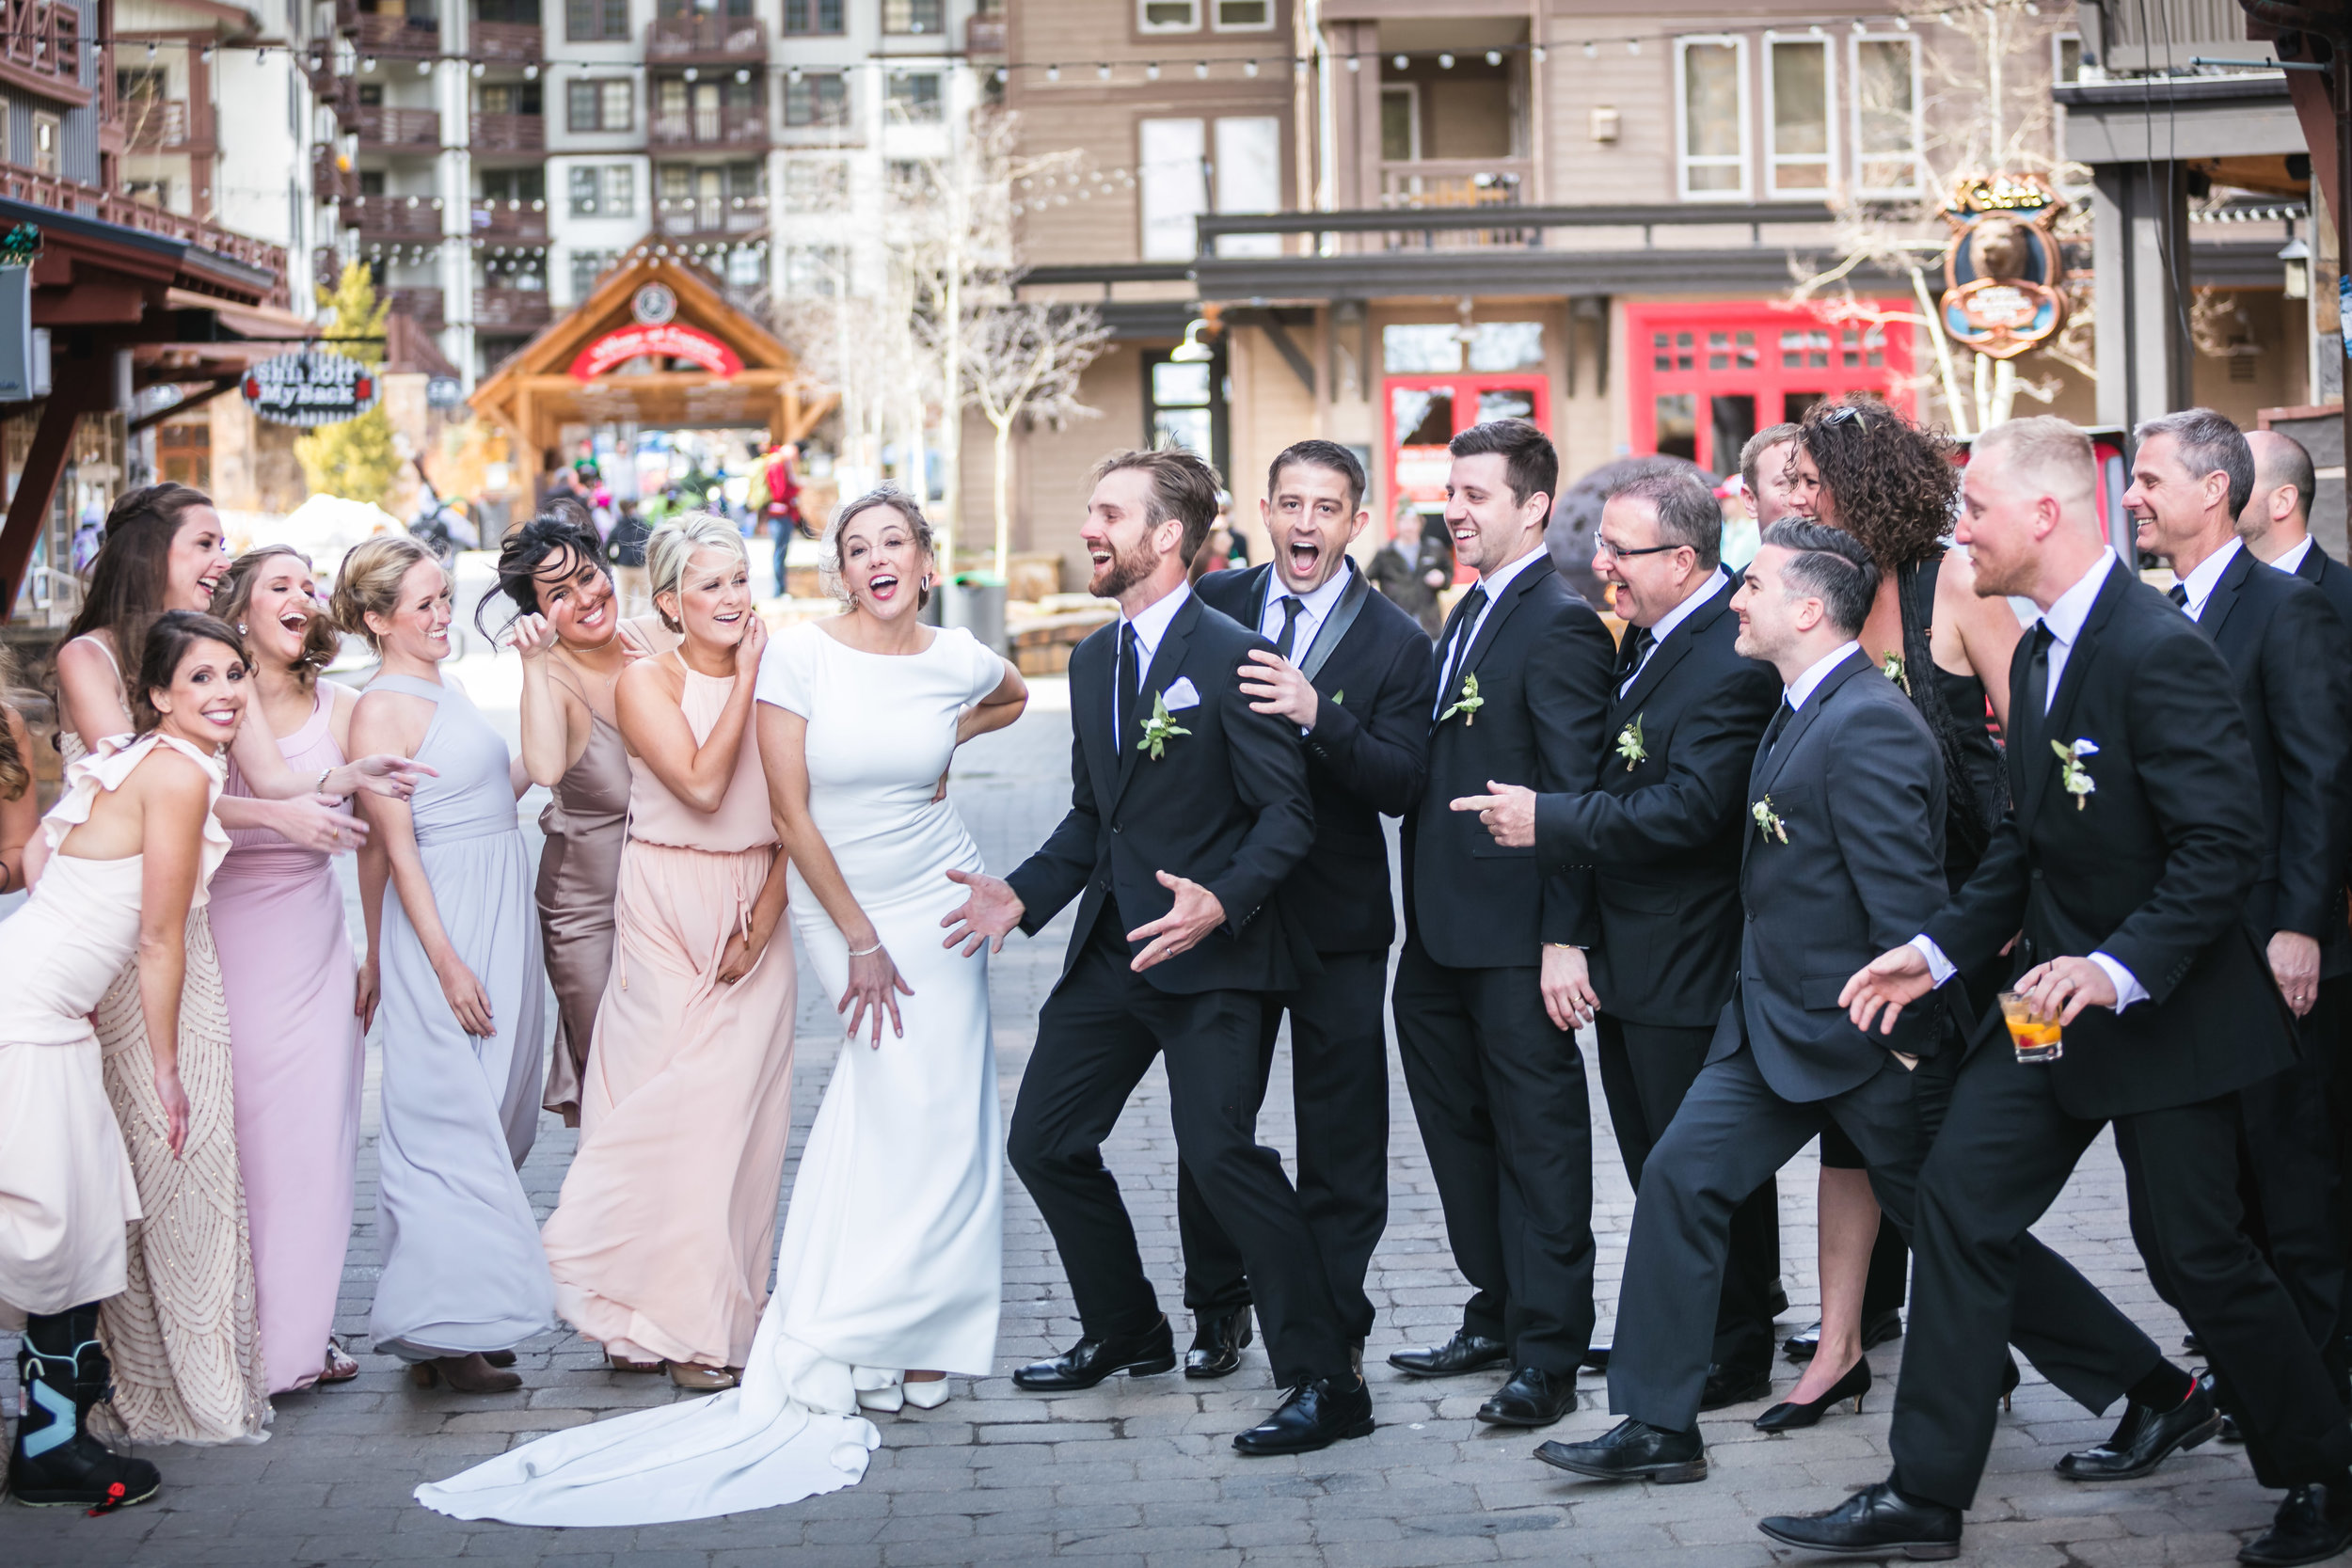 vild-photography-photographer-colorado-intimate-wedding-adventure-Stephanie- Adam-439.jpg